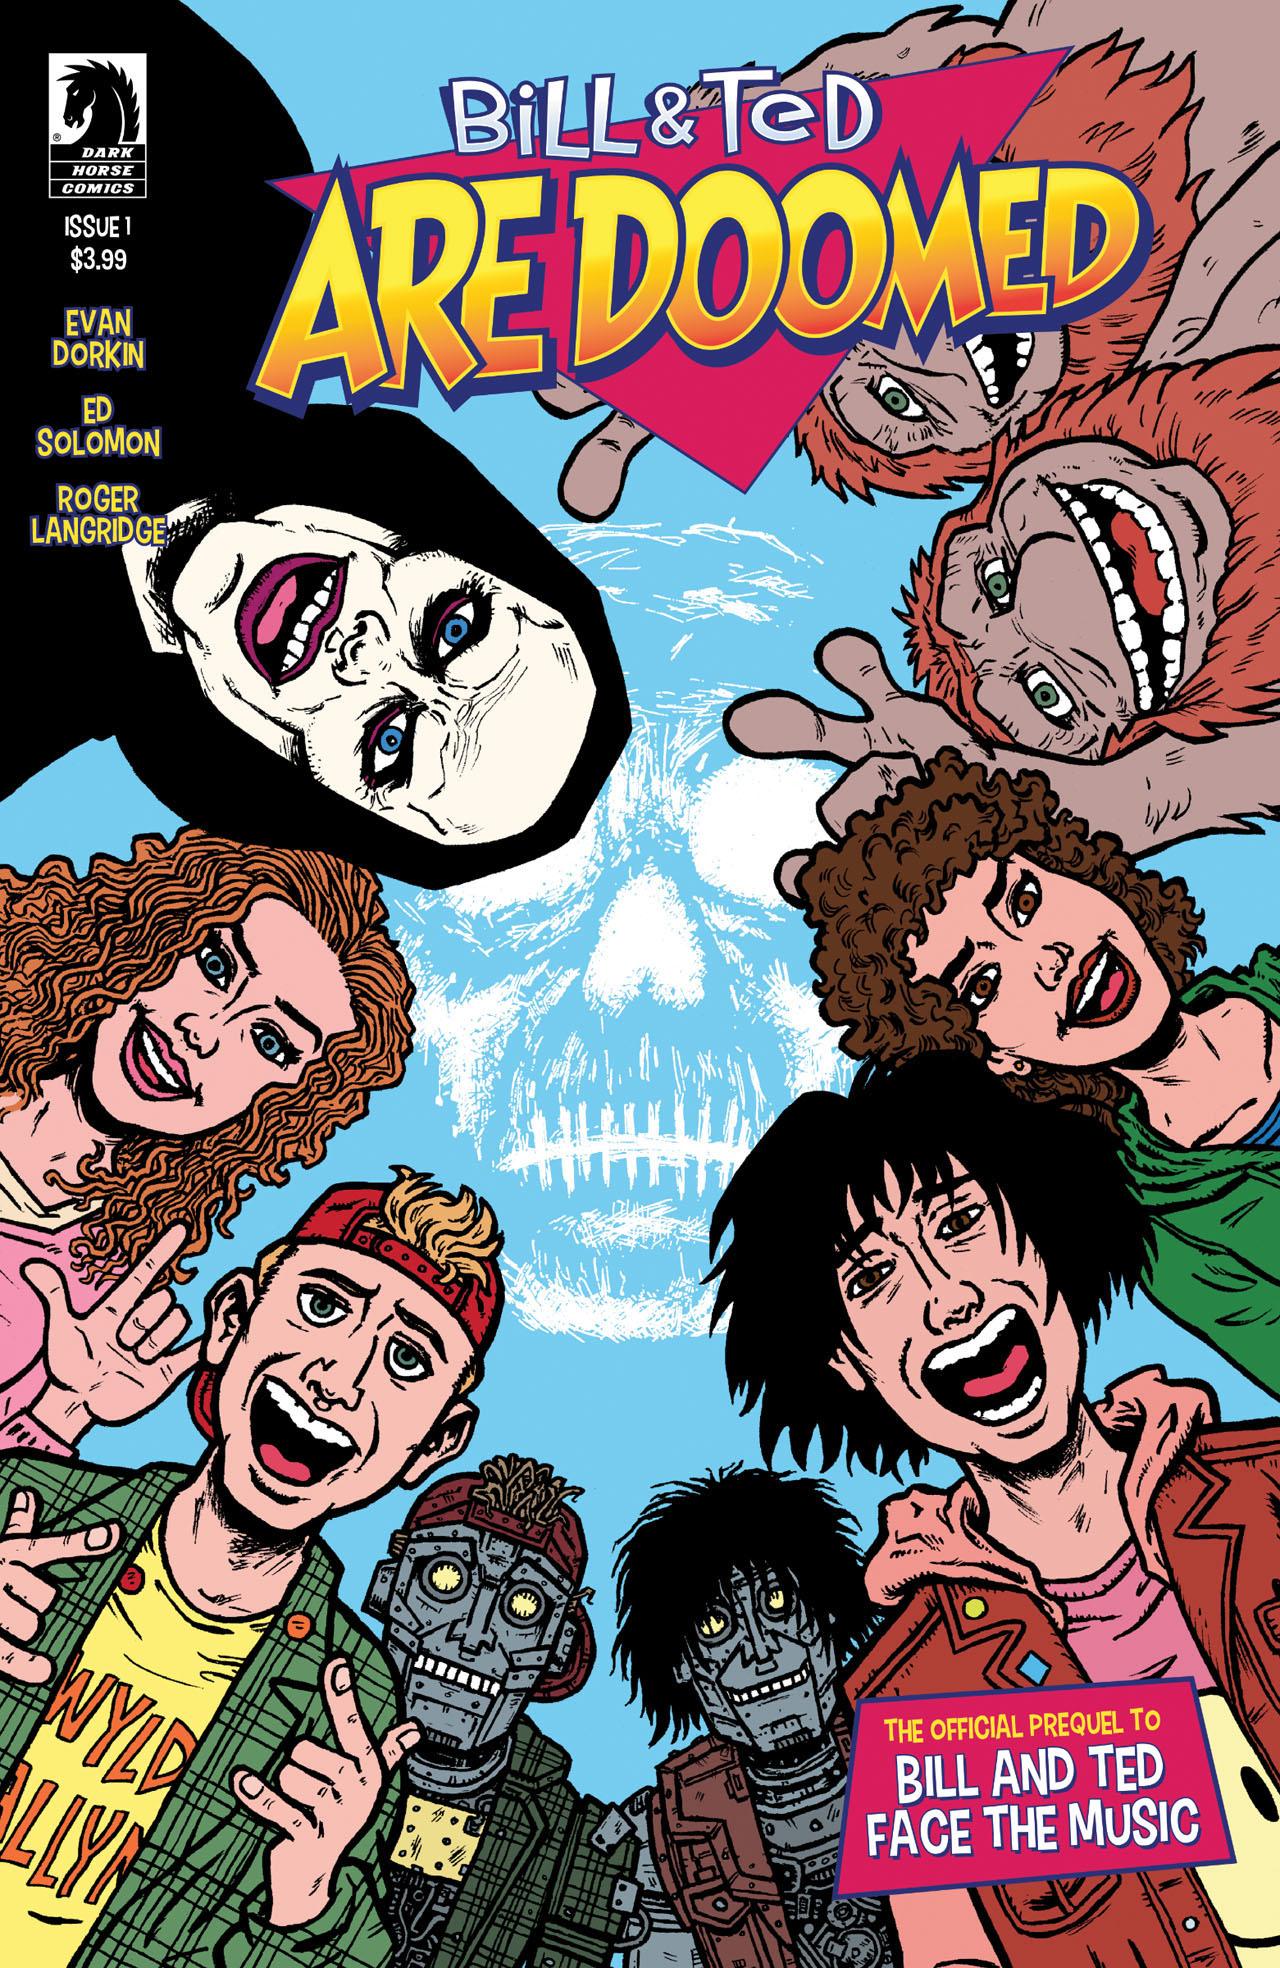 Portada de Bill & Ted Are Doomed #1 (2020). Arte por Evan Dorkin y Sarah Dyer. Imagen: Dark Horse Comics